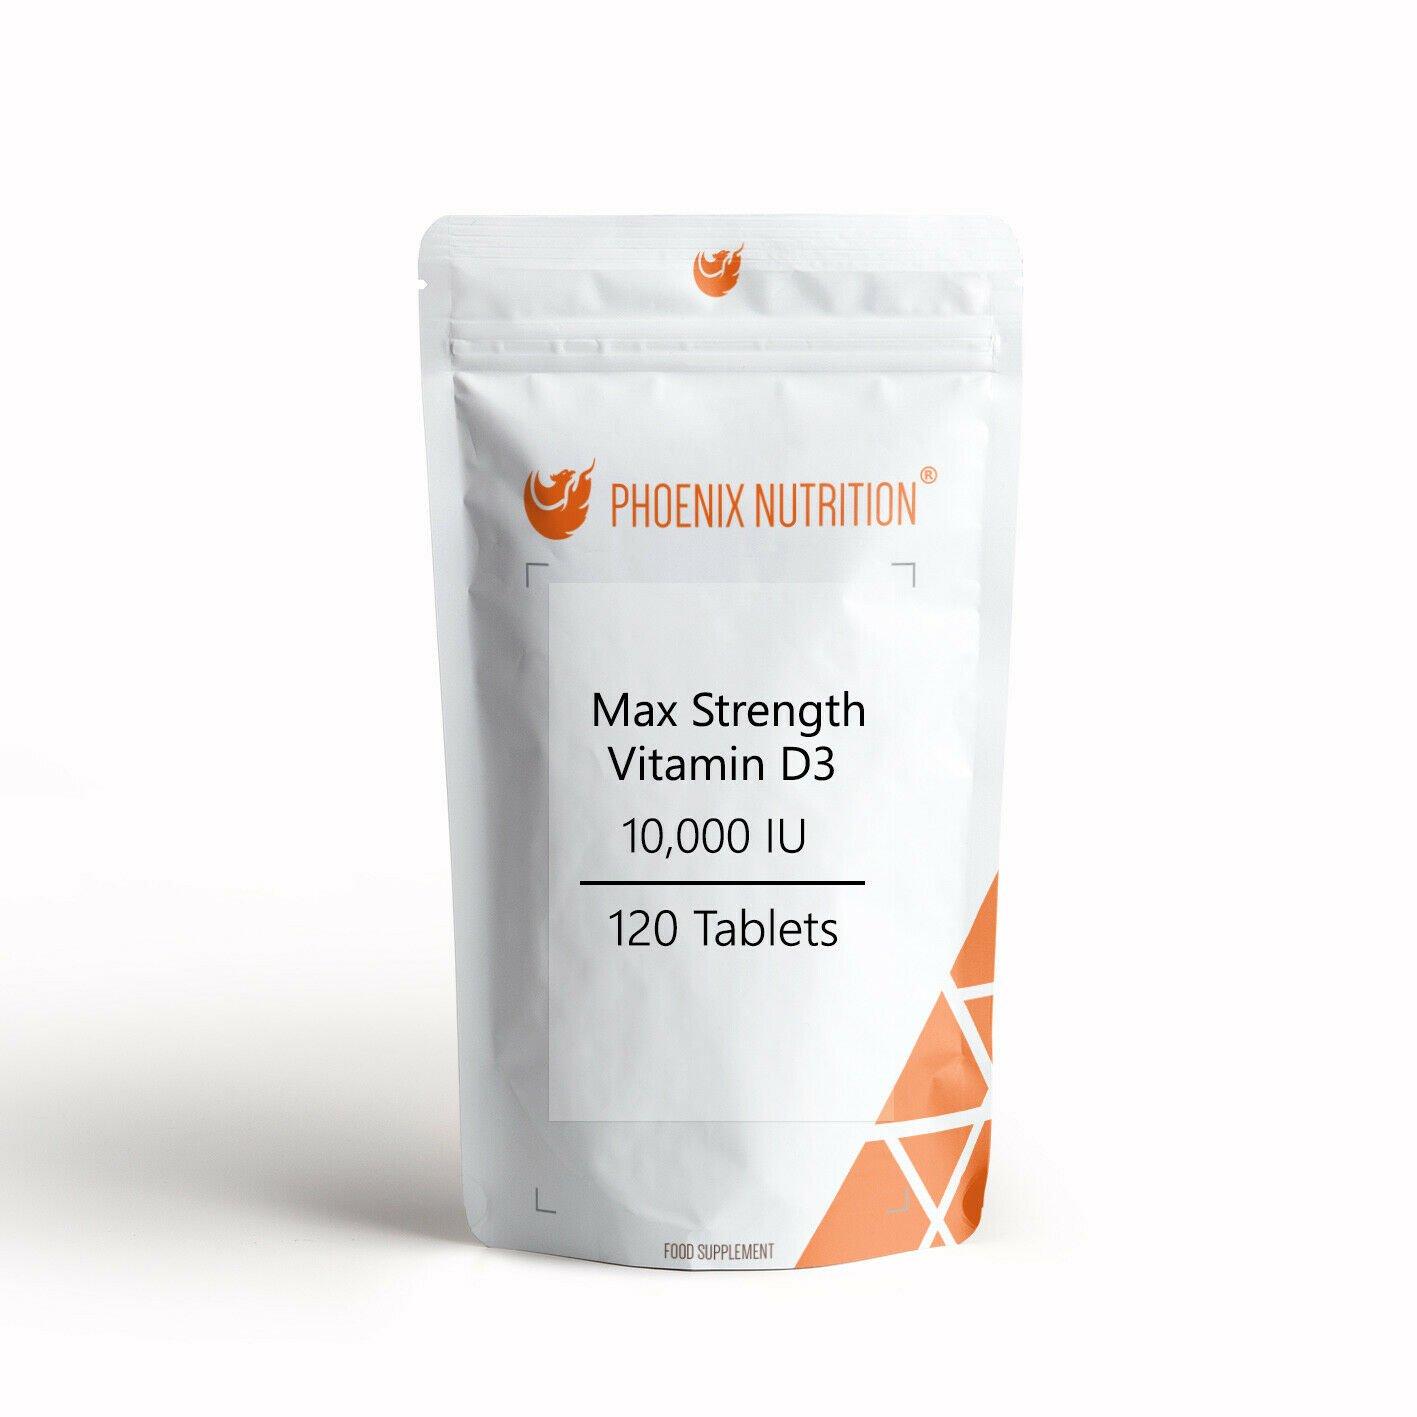 Max Strength Vitamin D3 10,000IU x 120 Tablets - Cholecalciferol D 250mcg